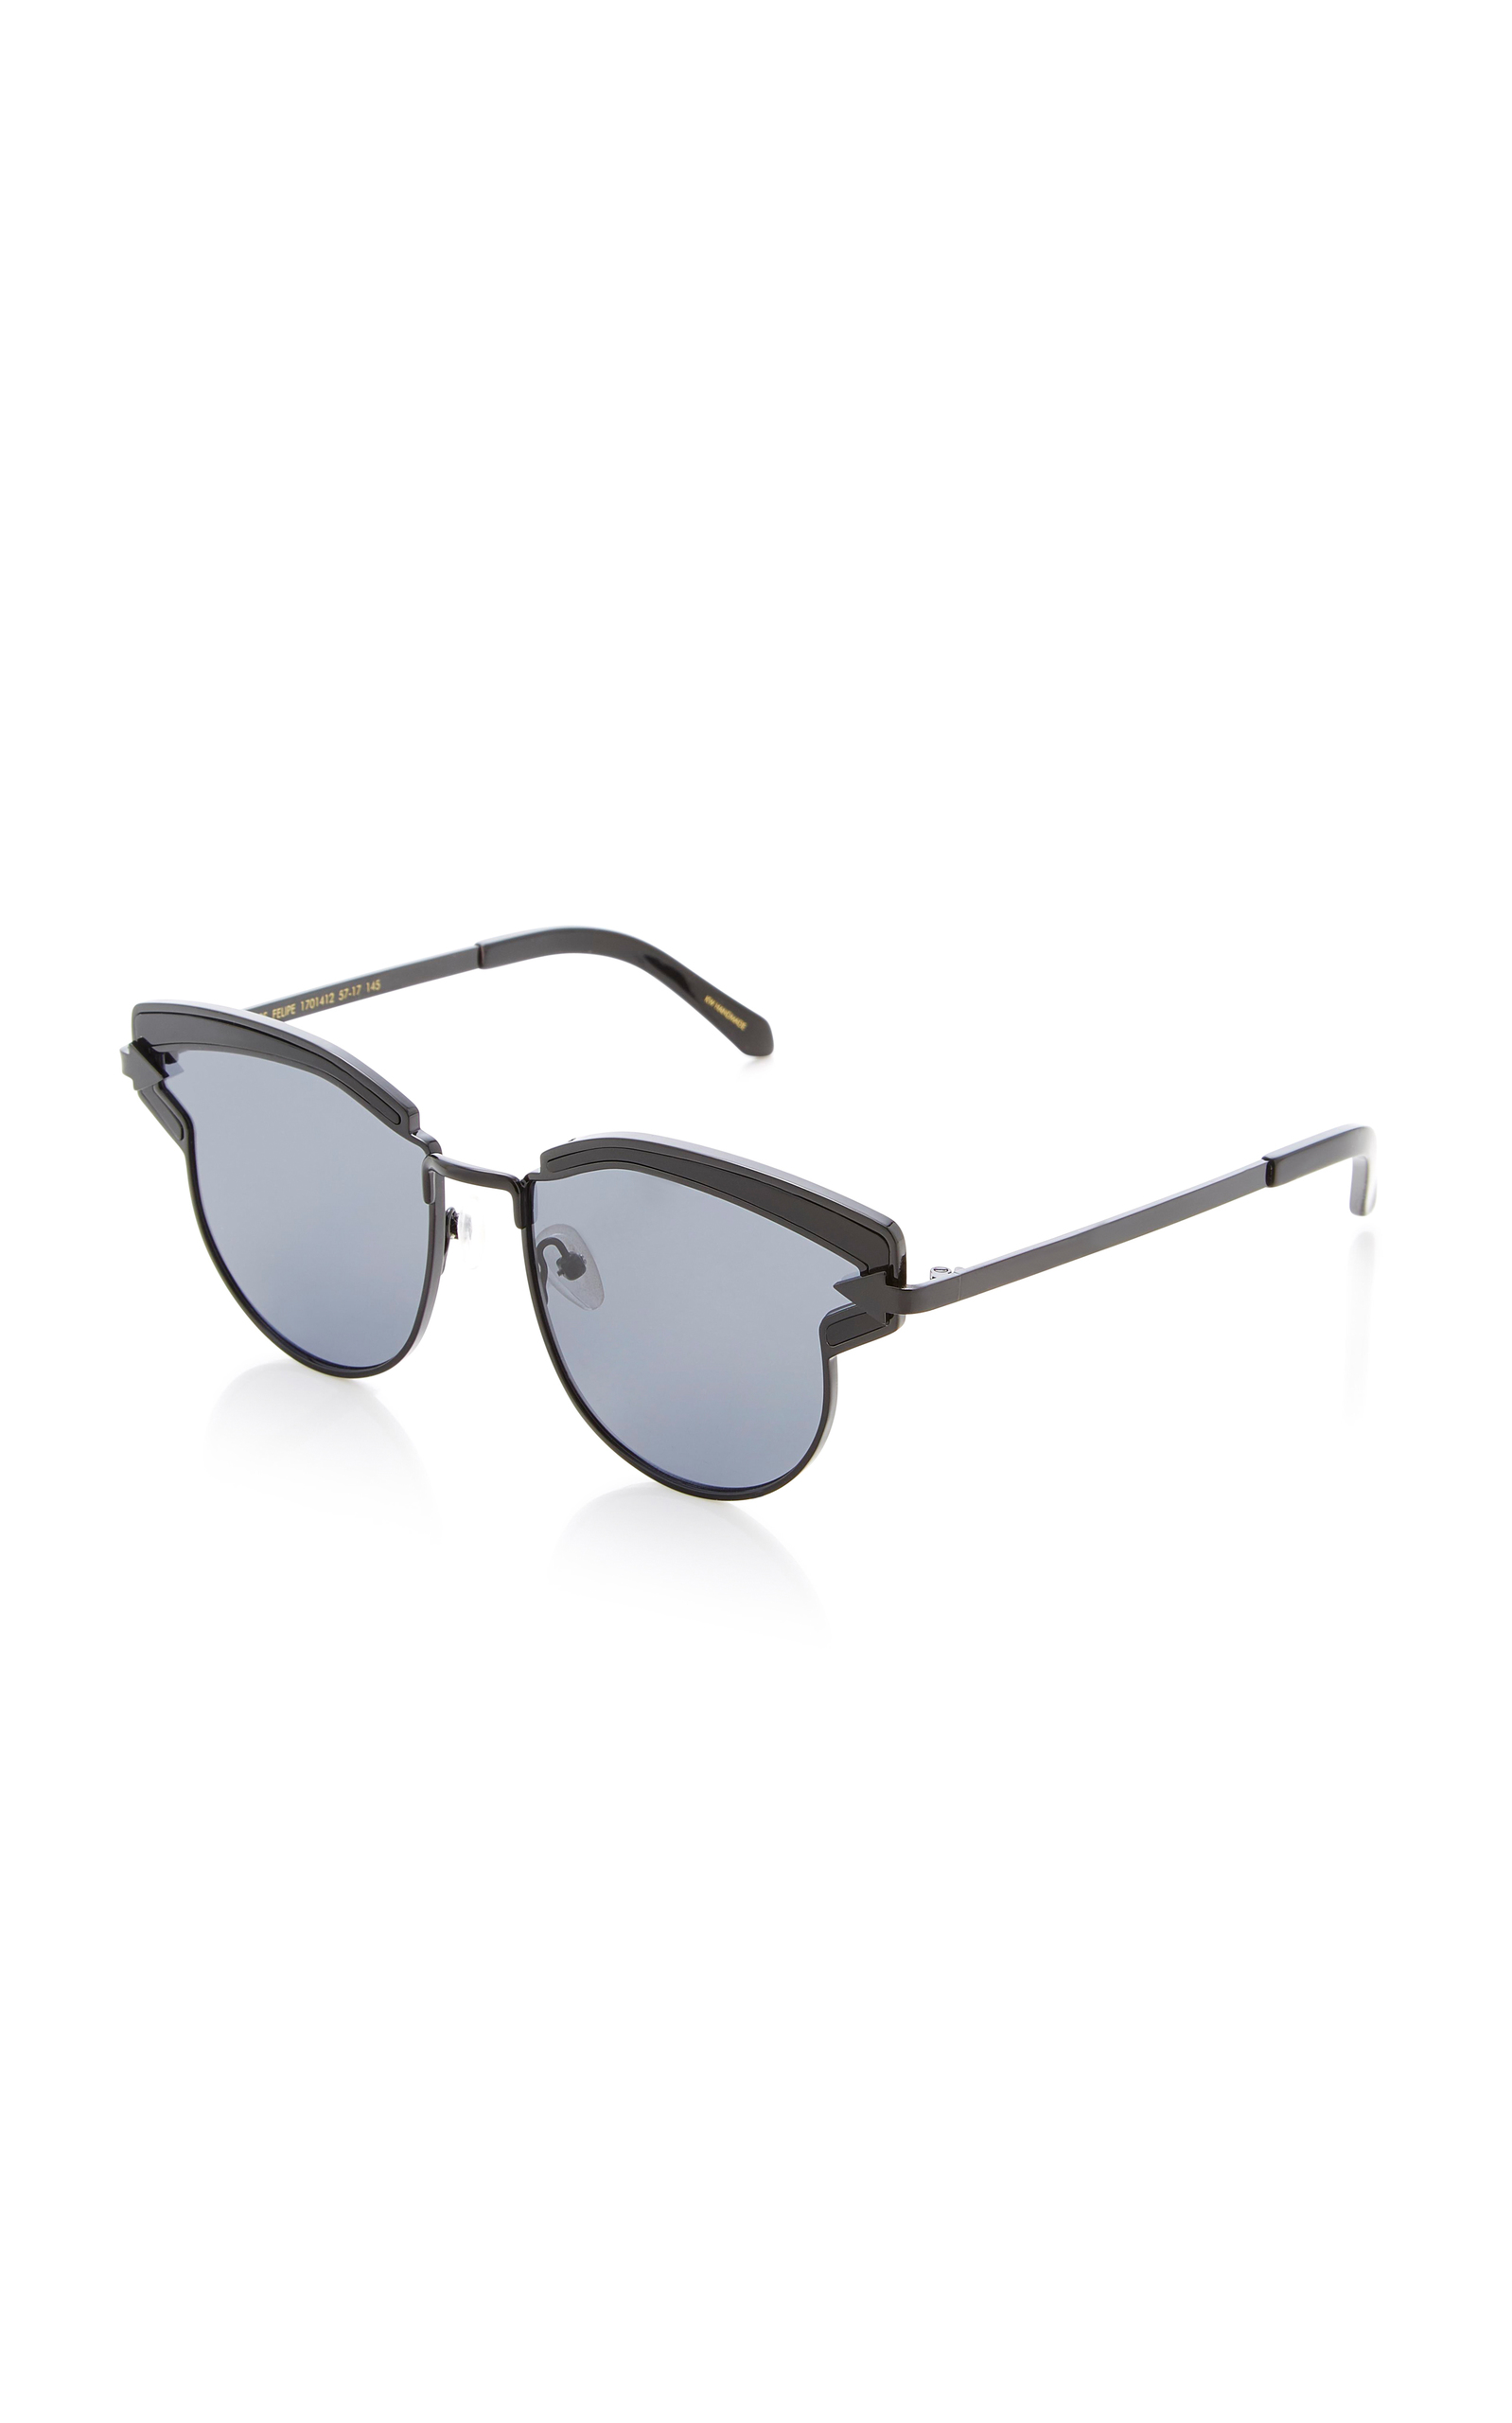 8f5d2a0ddc1e Karen WalkerSuperstar Felipe Cat-Eye Acetate Sunglasses. CLOSE. Loading.  Loading